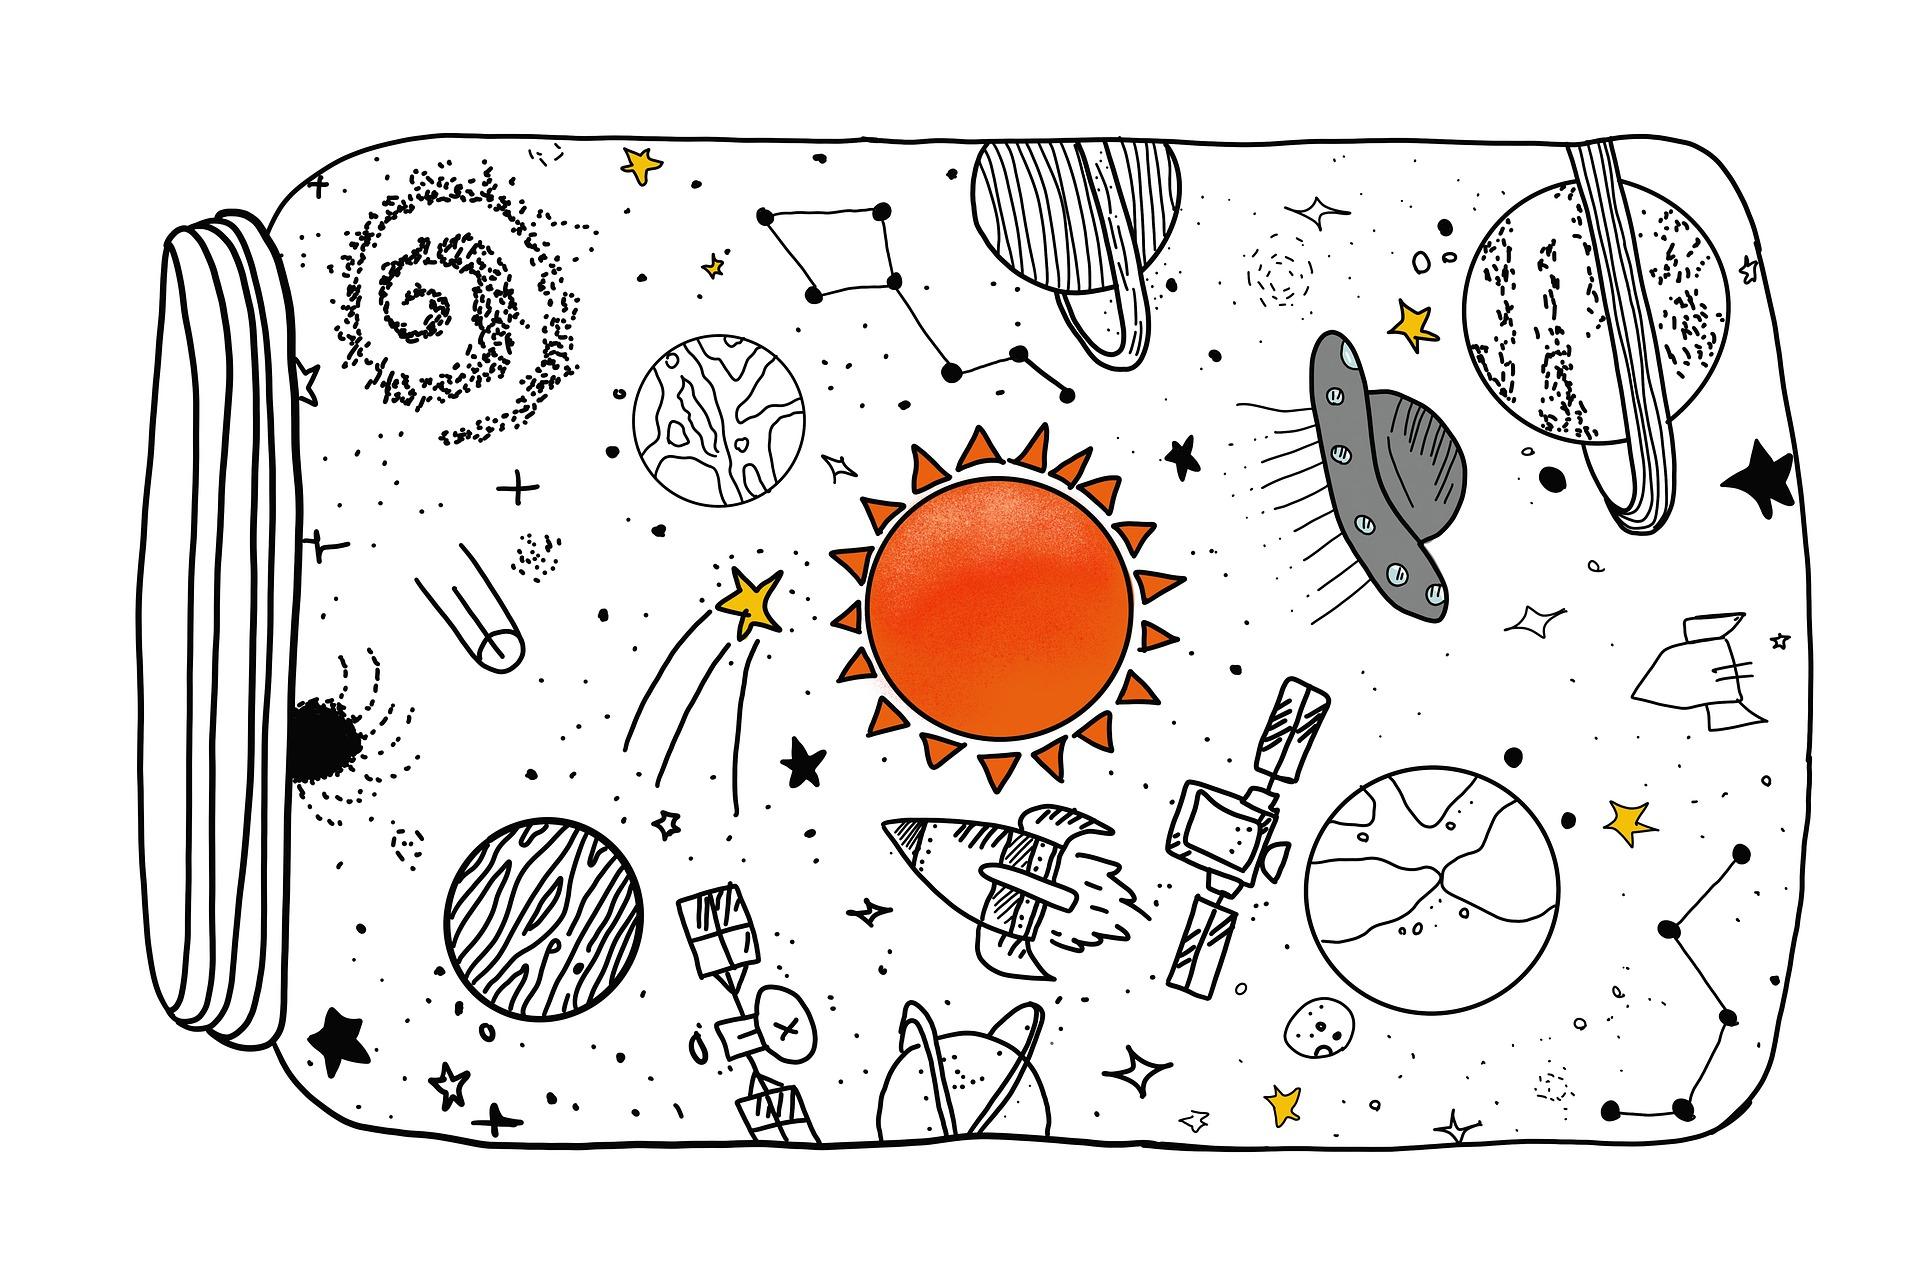 cosmos-4112660_1920.jpg